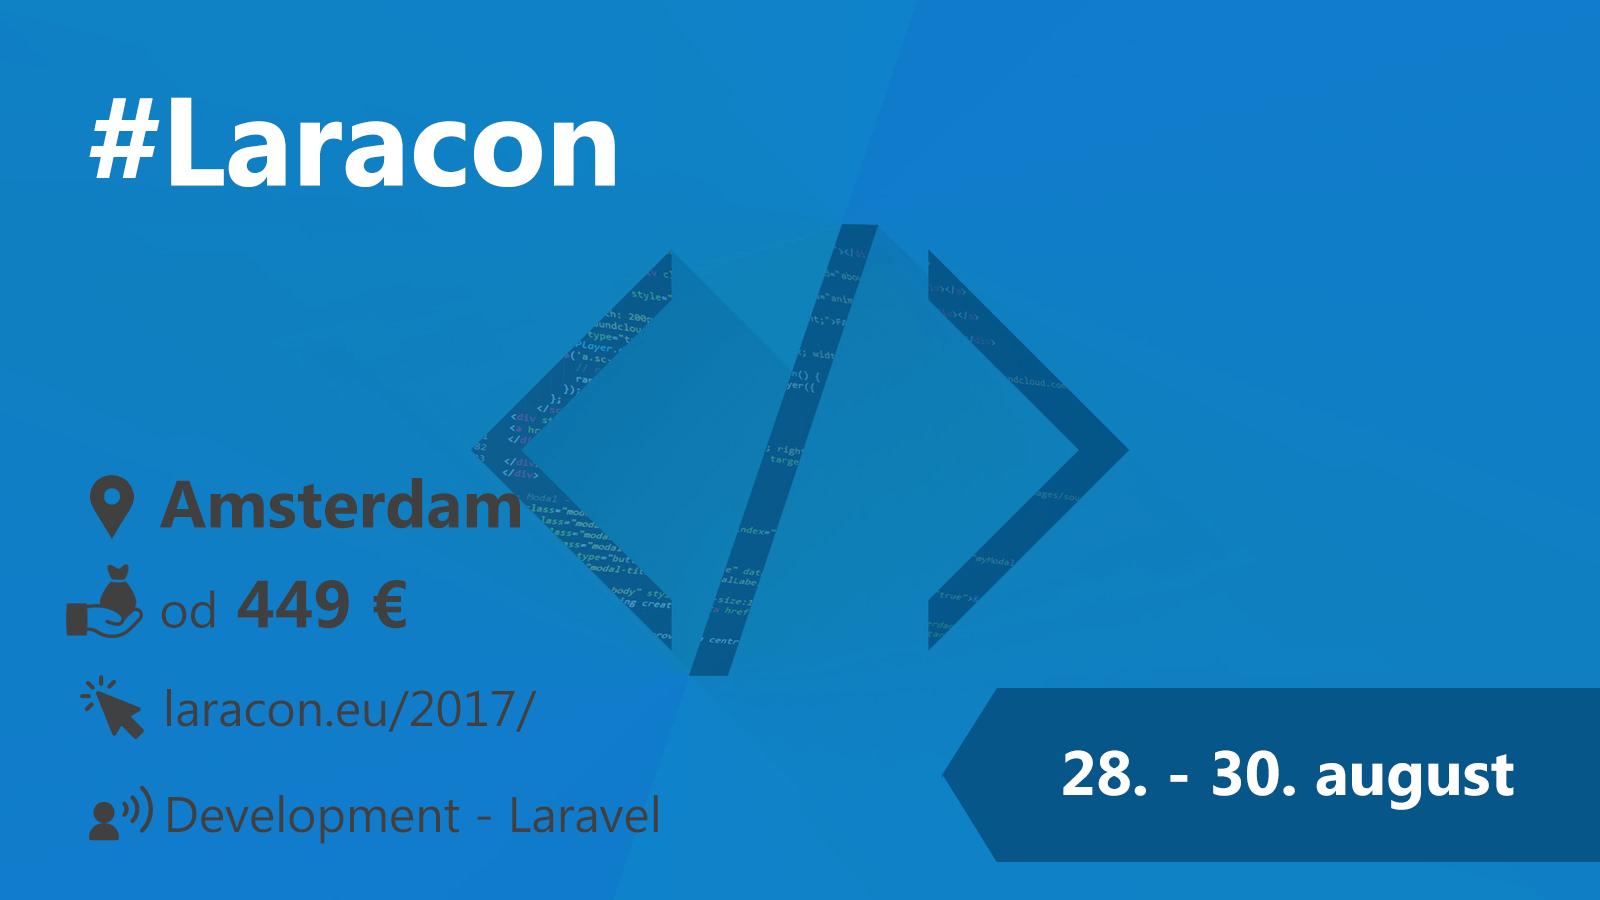 #Laracon 28.-30. 8